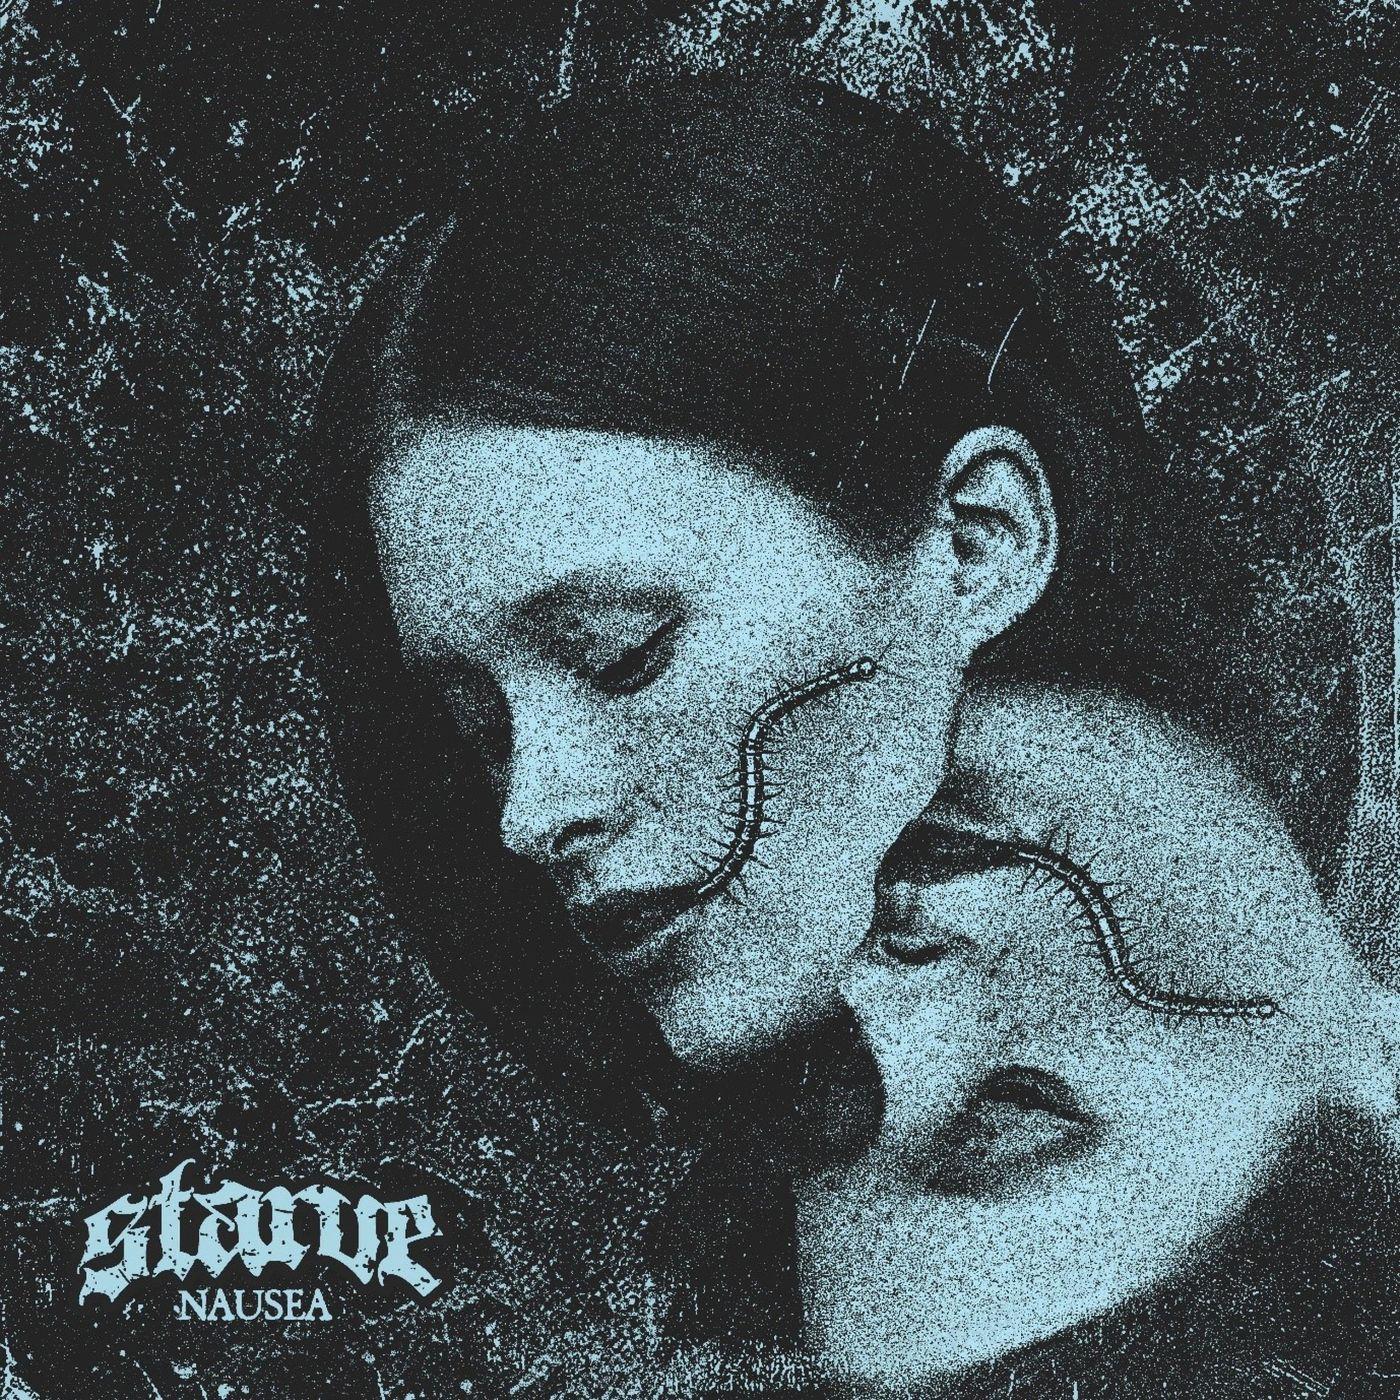 Starve - Nausea [EP] (2021)